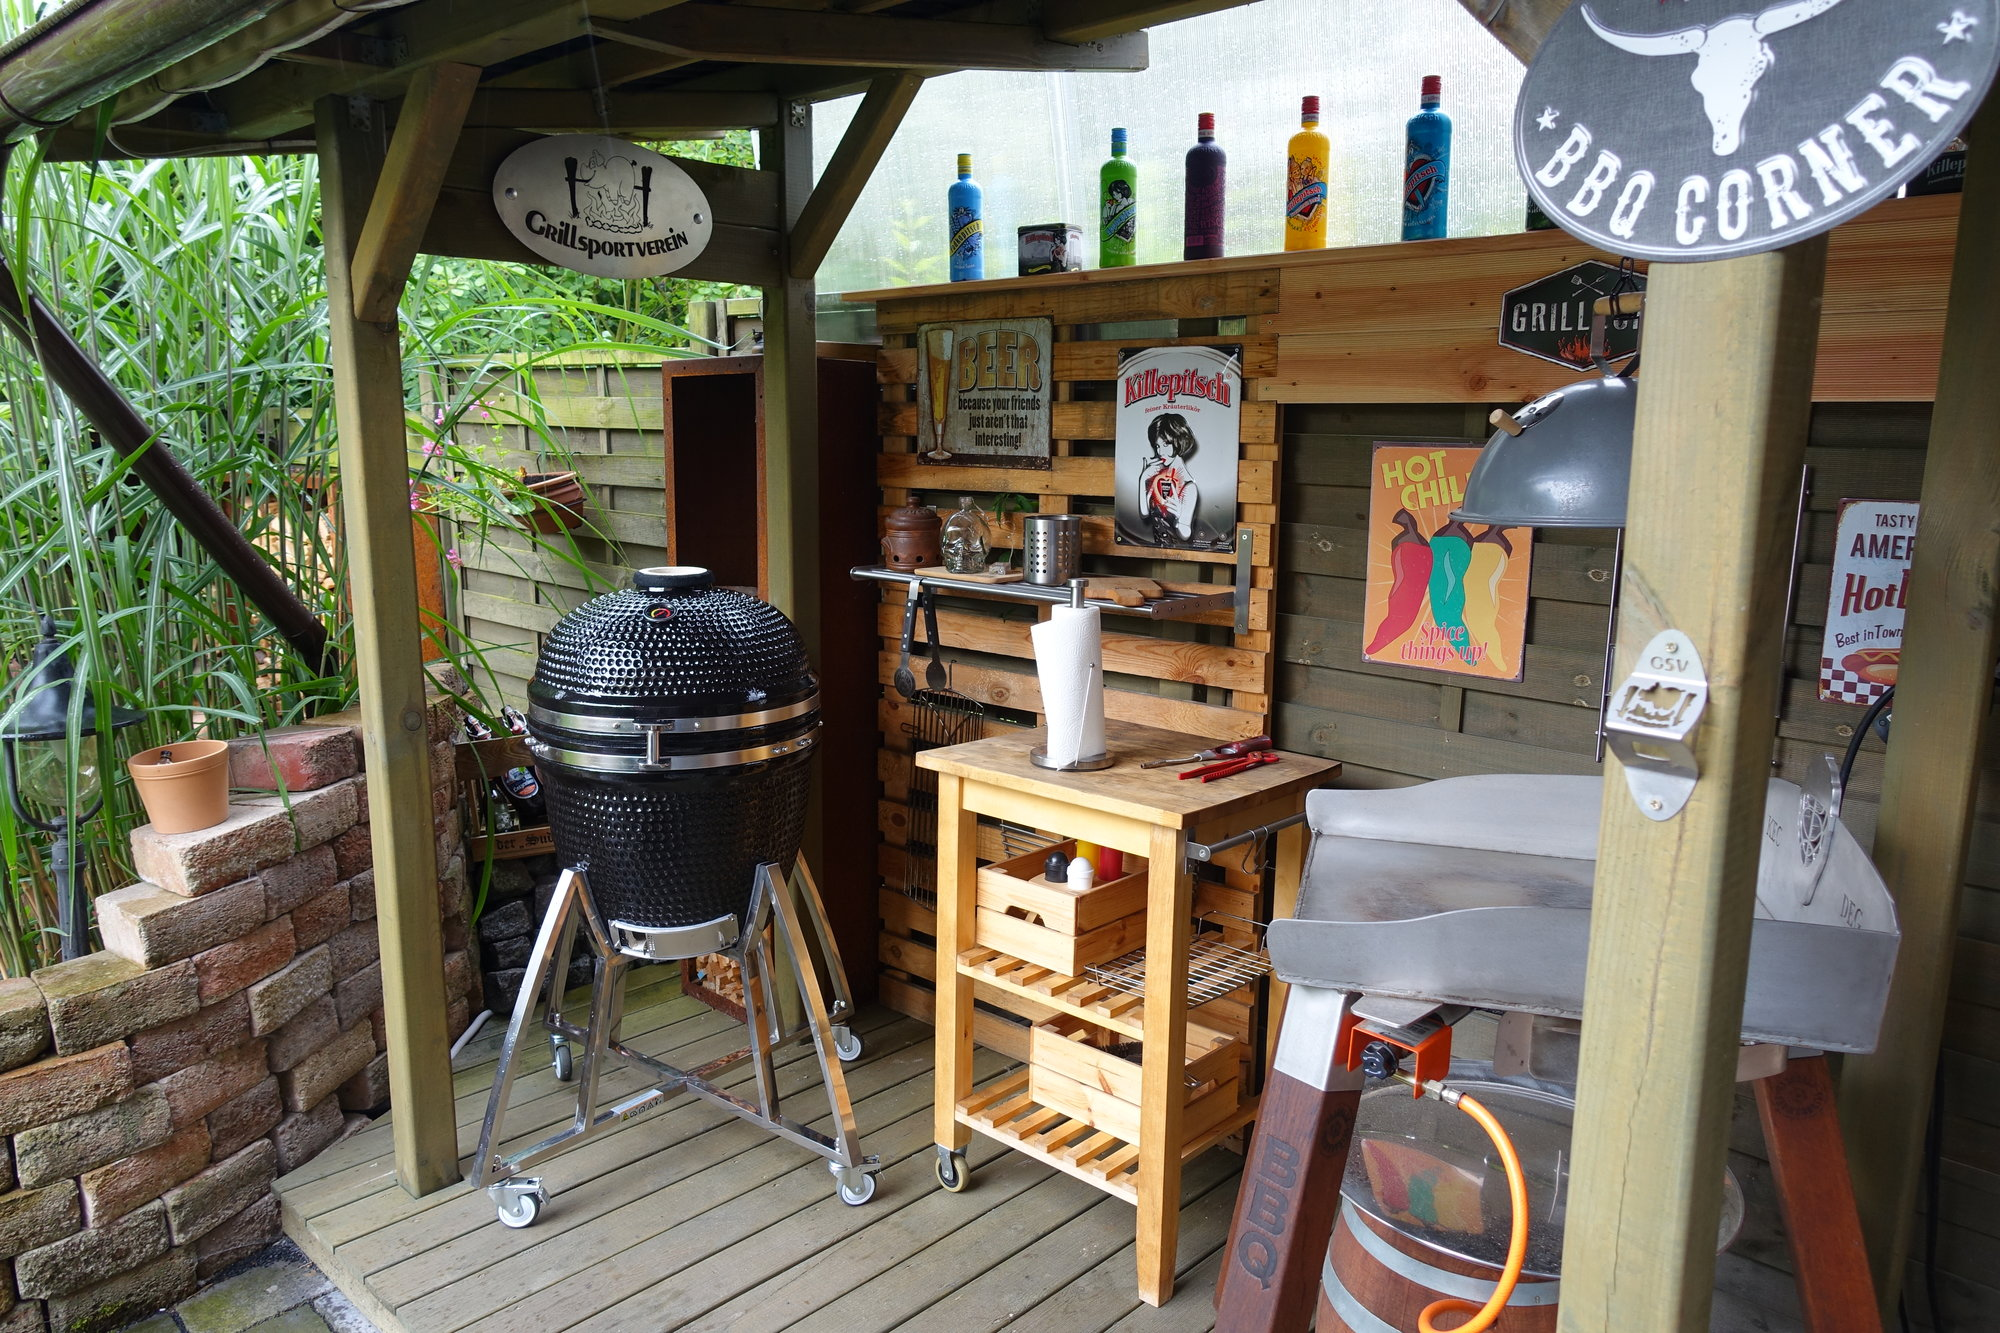 Aldi Holzkohlegrill Uk : Aldi holzkohlegrill fireking grill kamado holzkohlegrills und